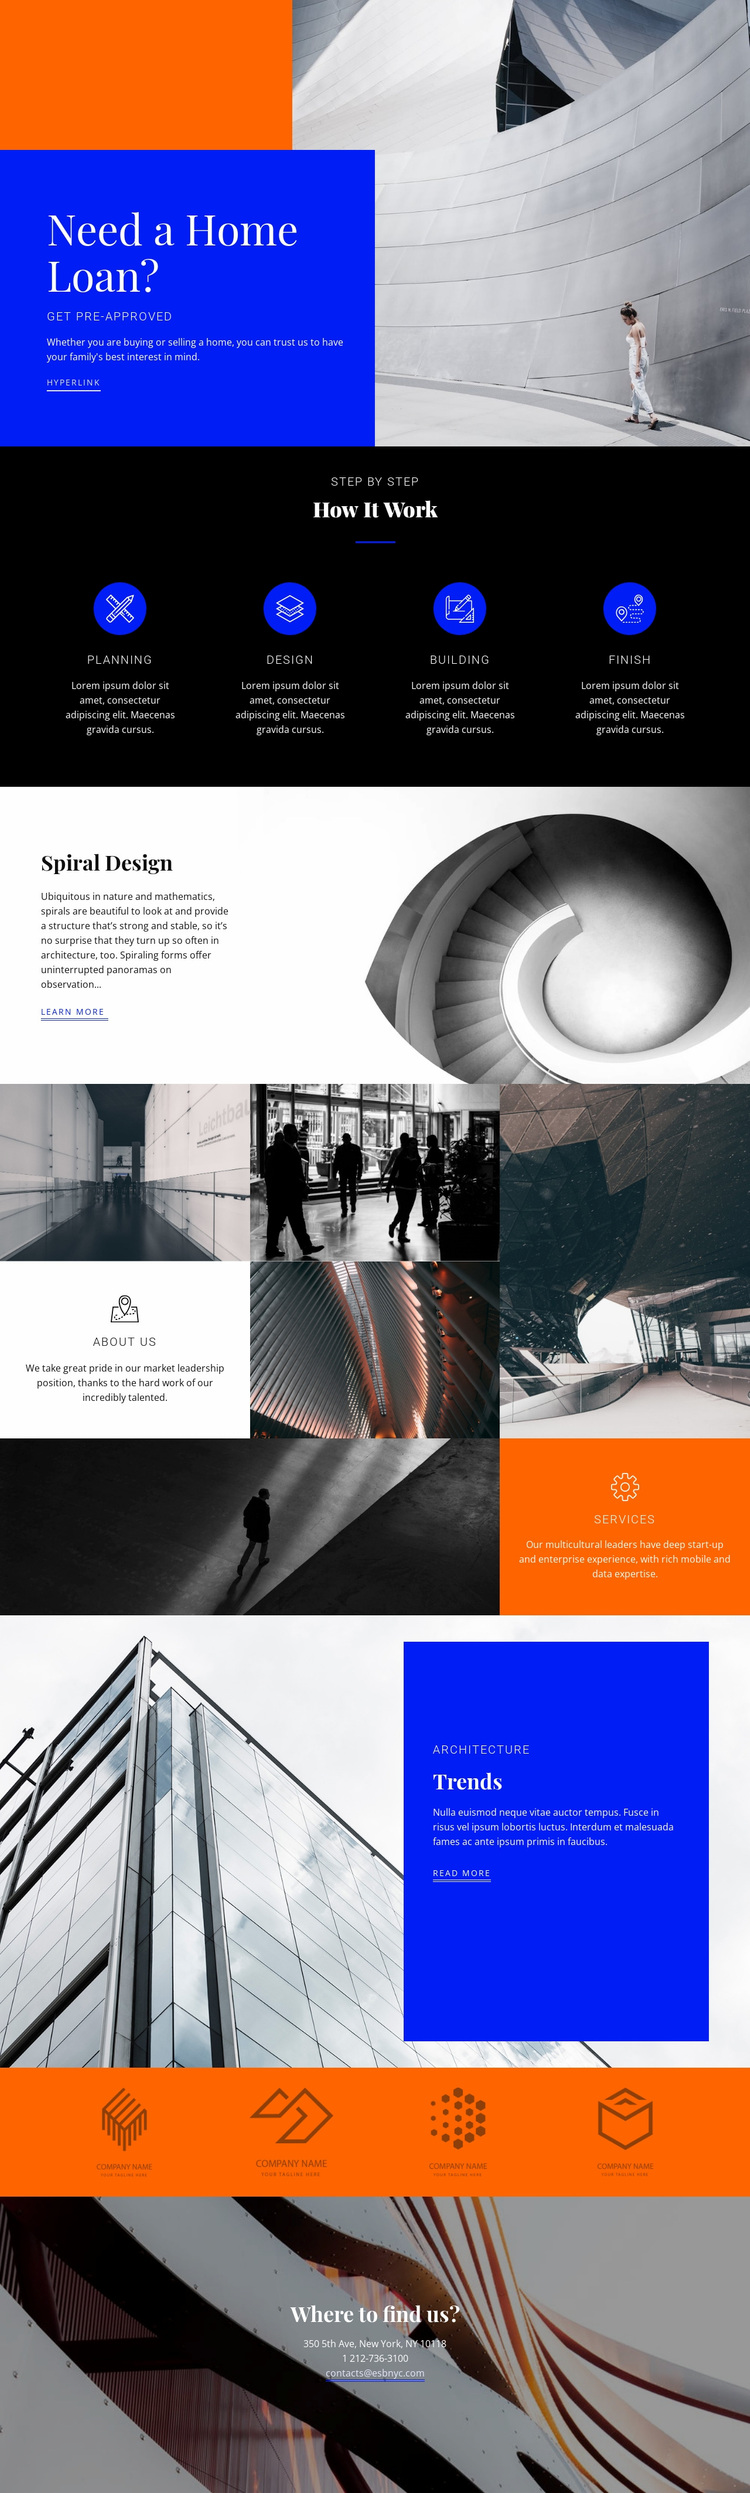 Local real estate agency Website Design